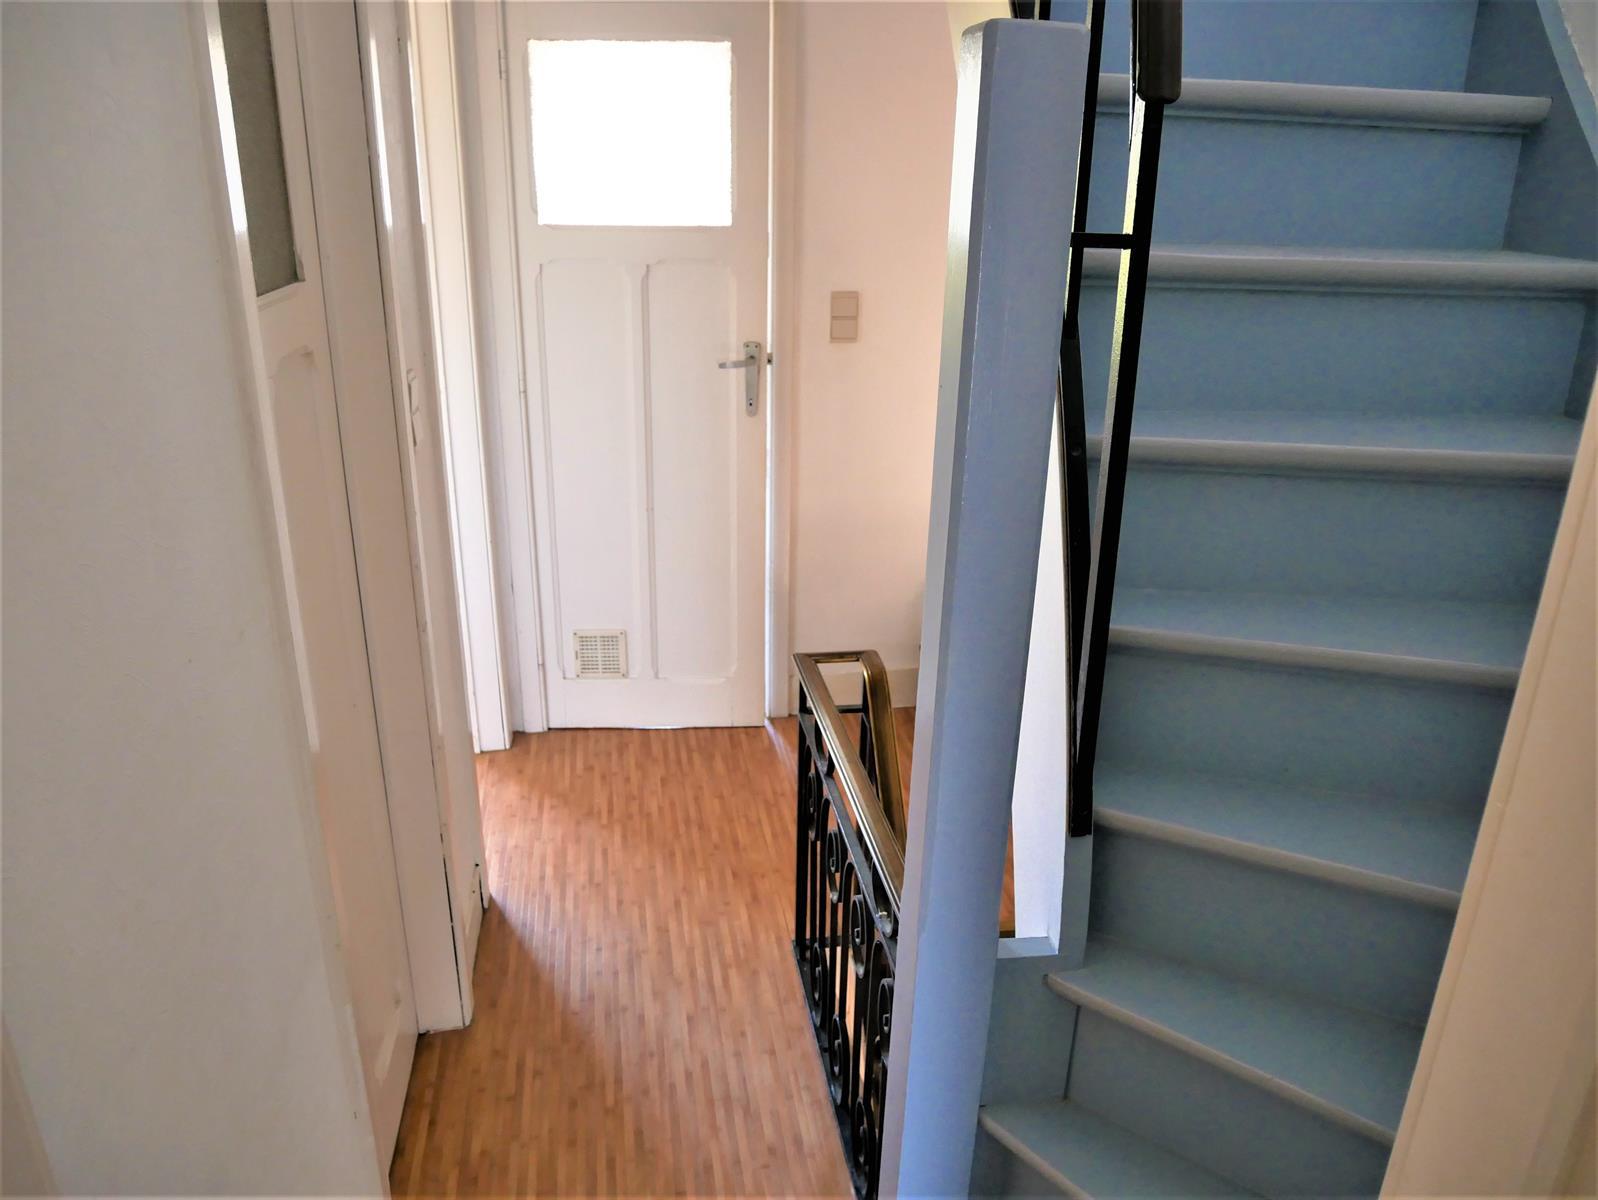 Maison - Ottignies-Louvain-la-Neuve - #4345933-5